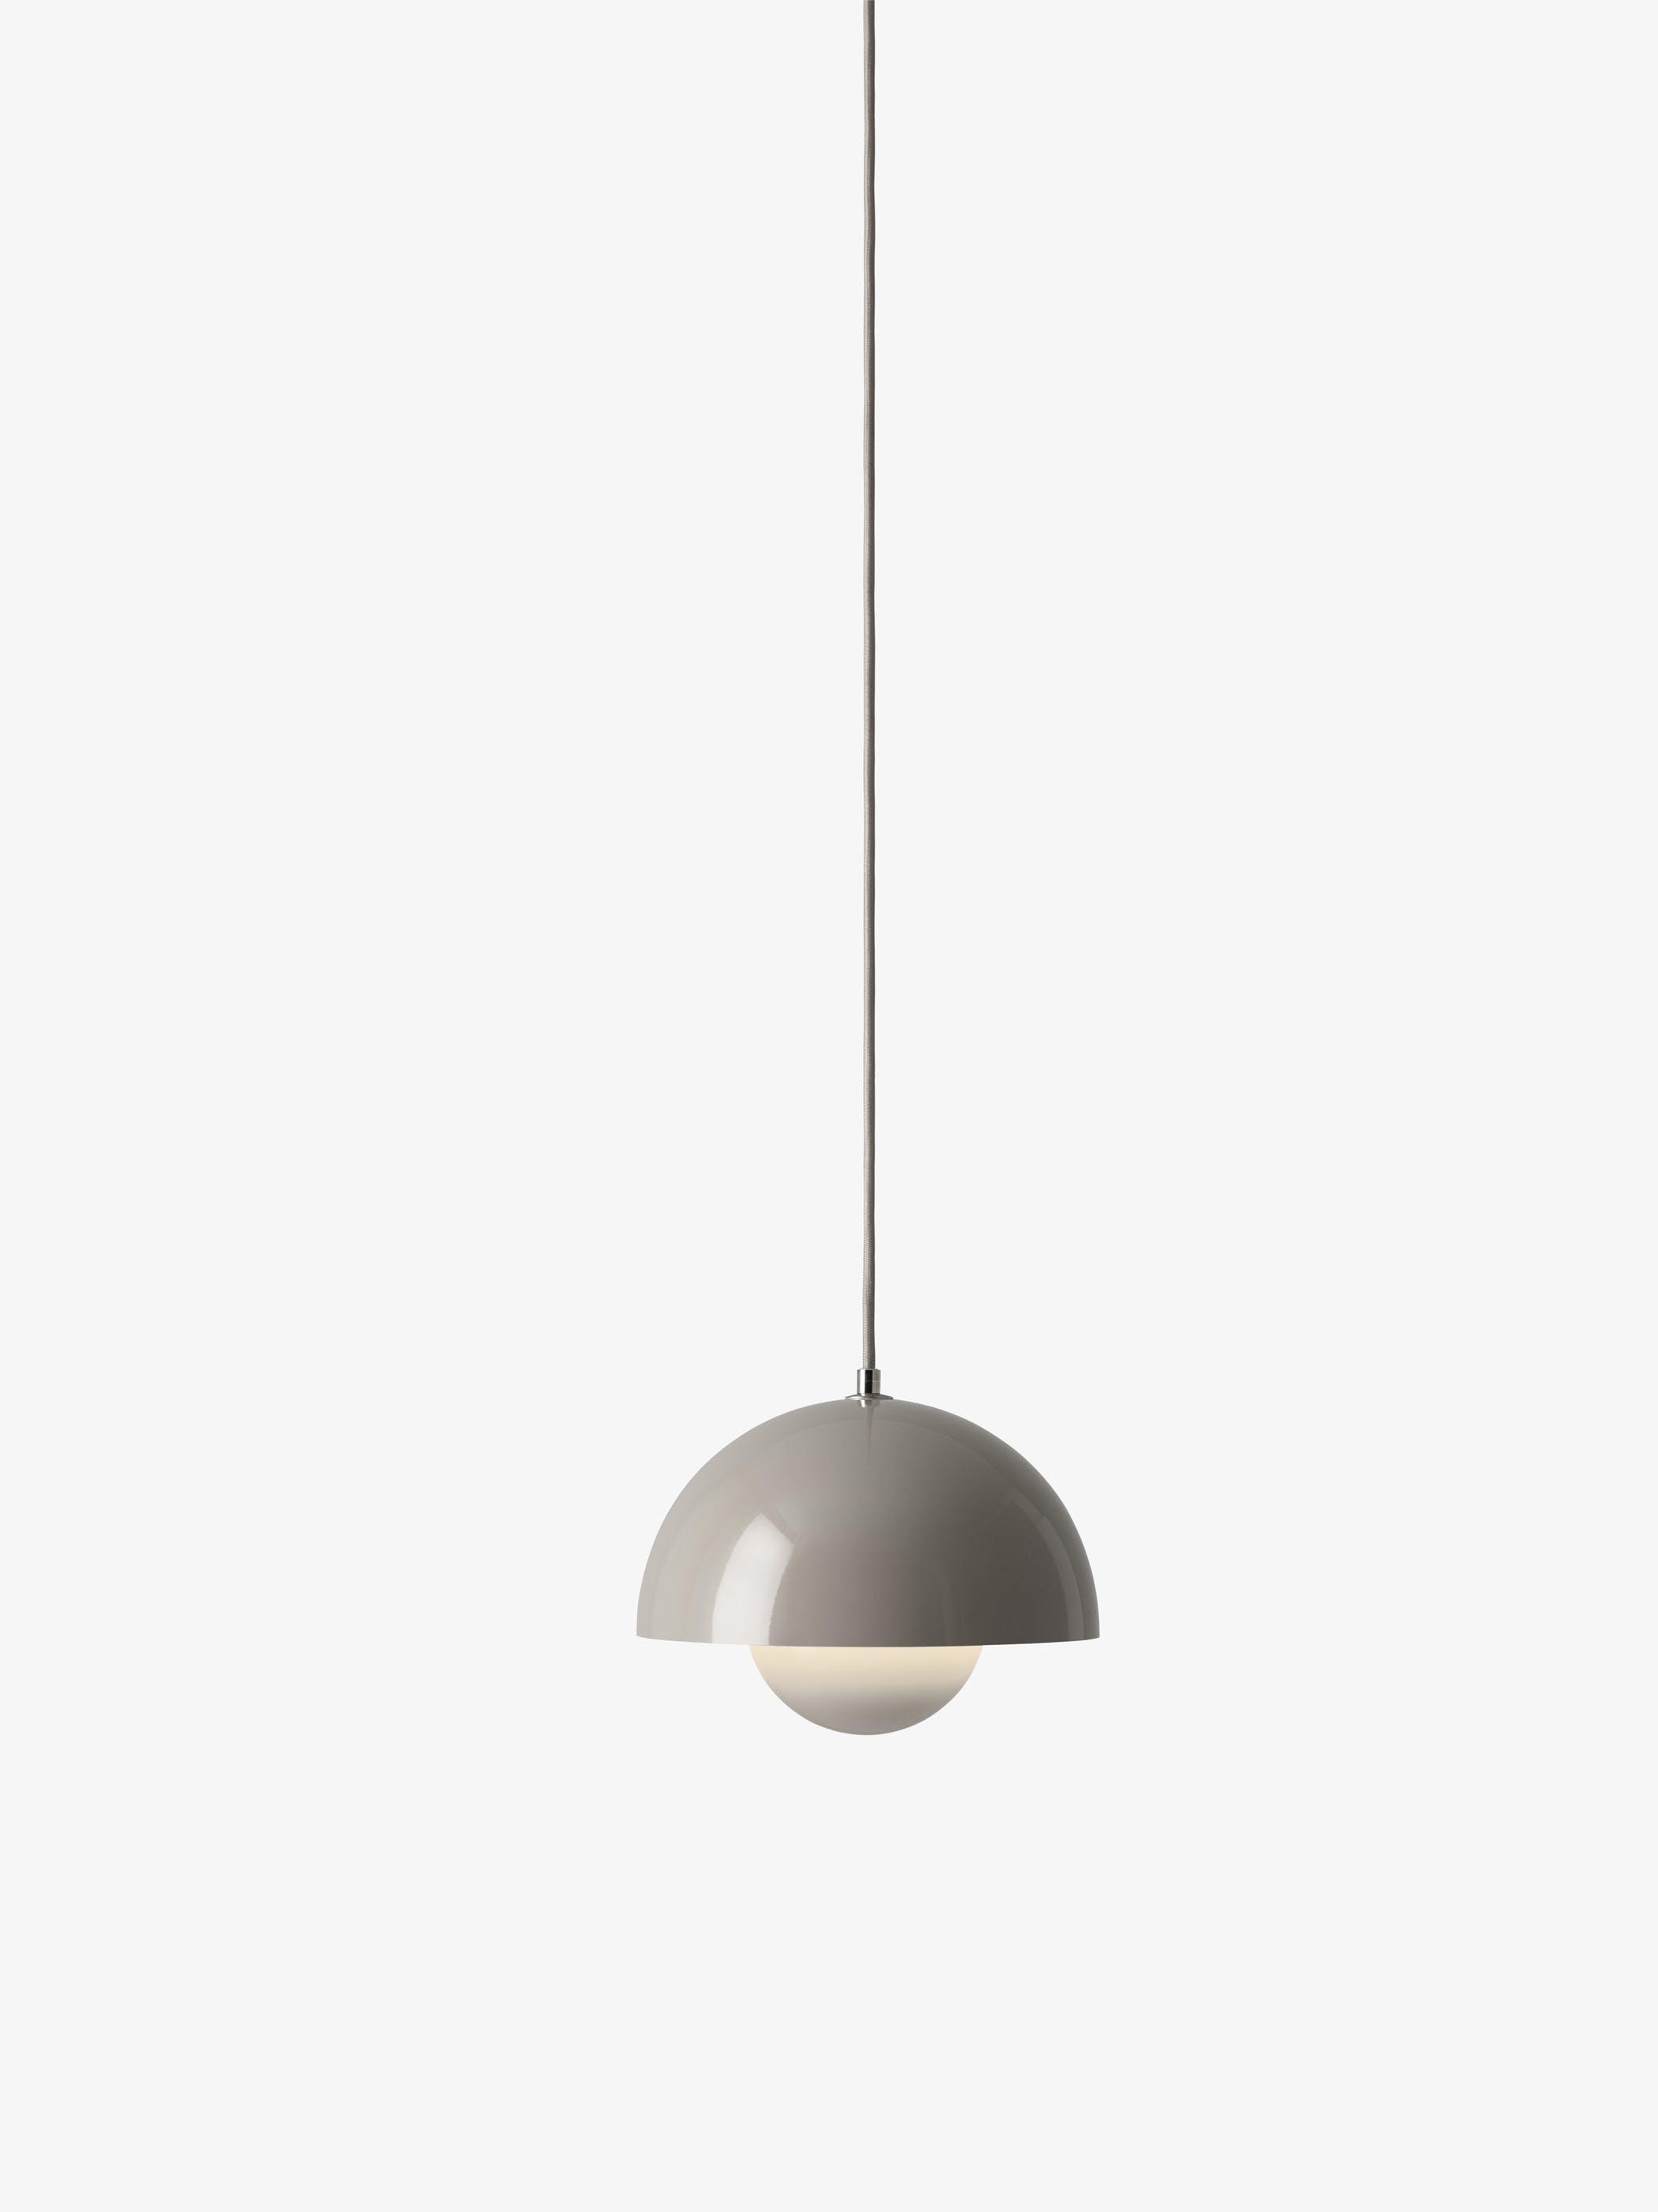 Flowerpot Pendant Vp1 Grey Beige Light 1